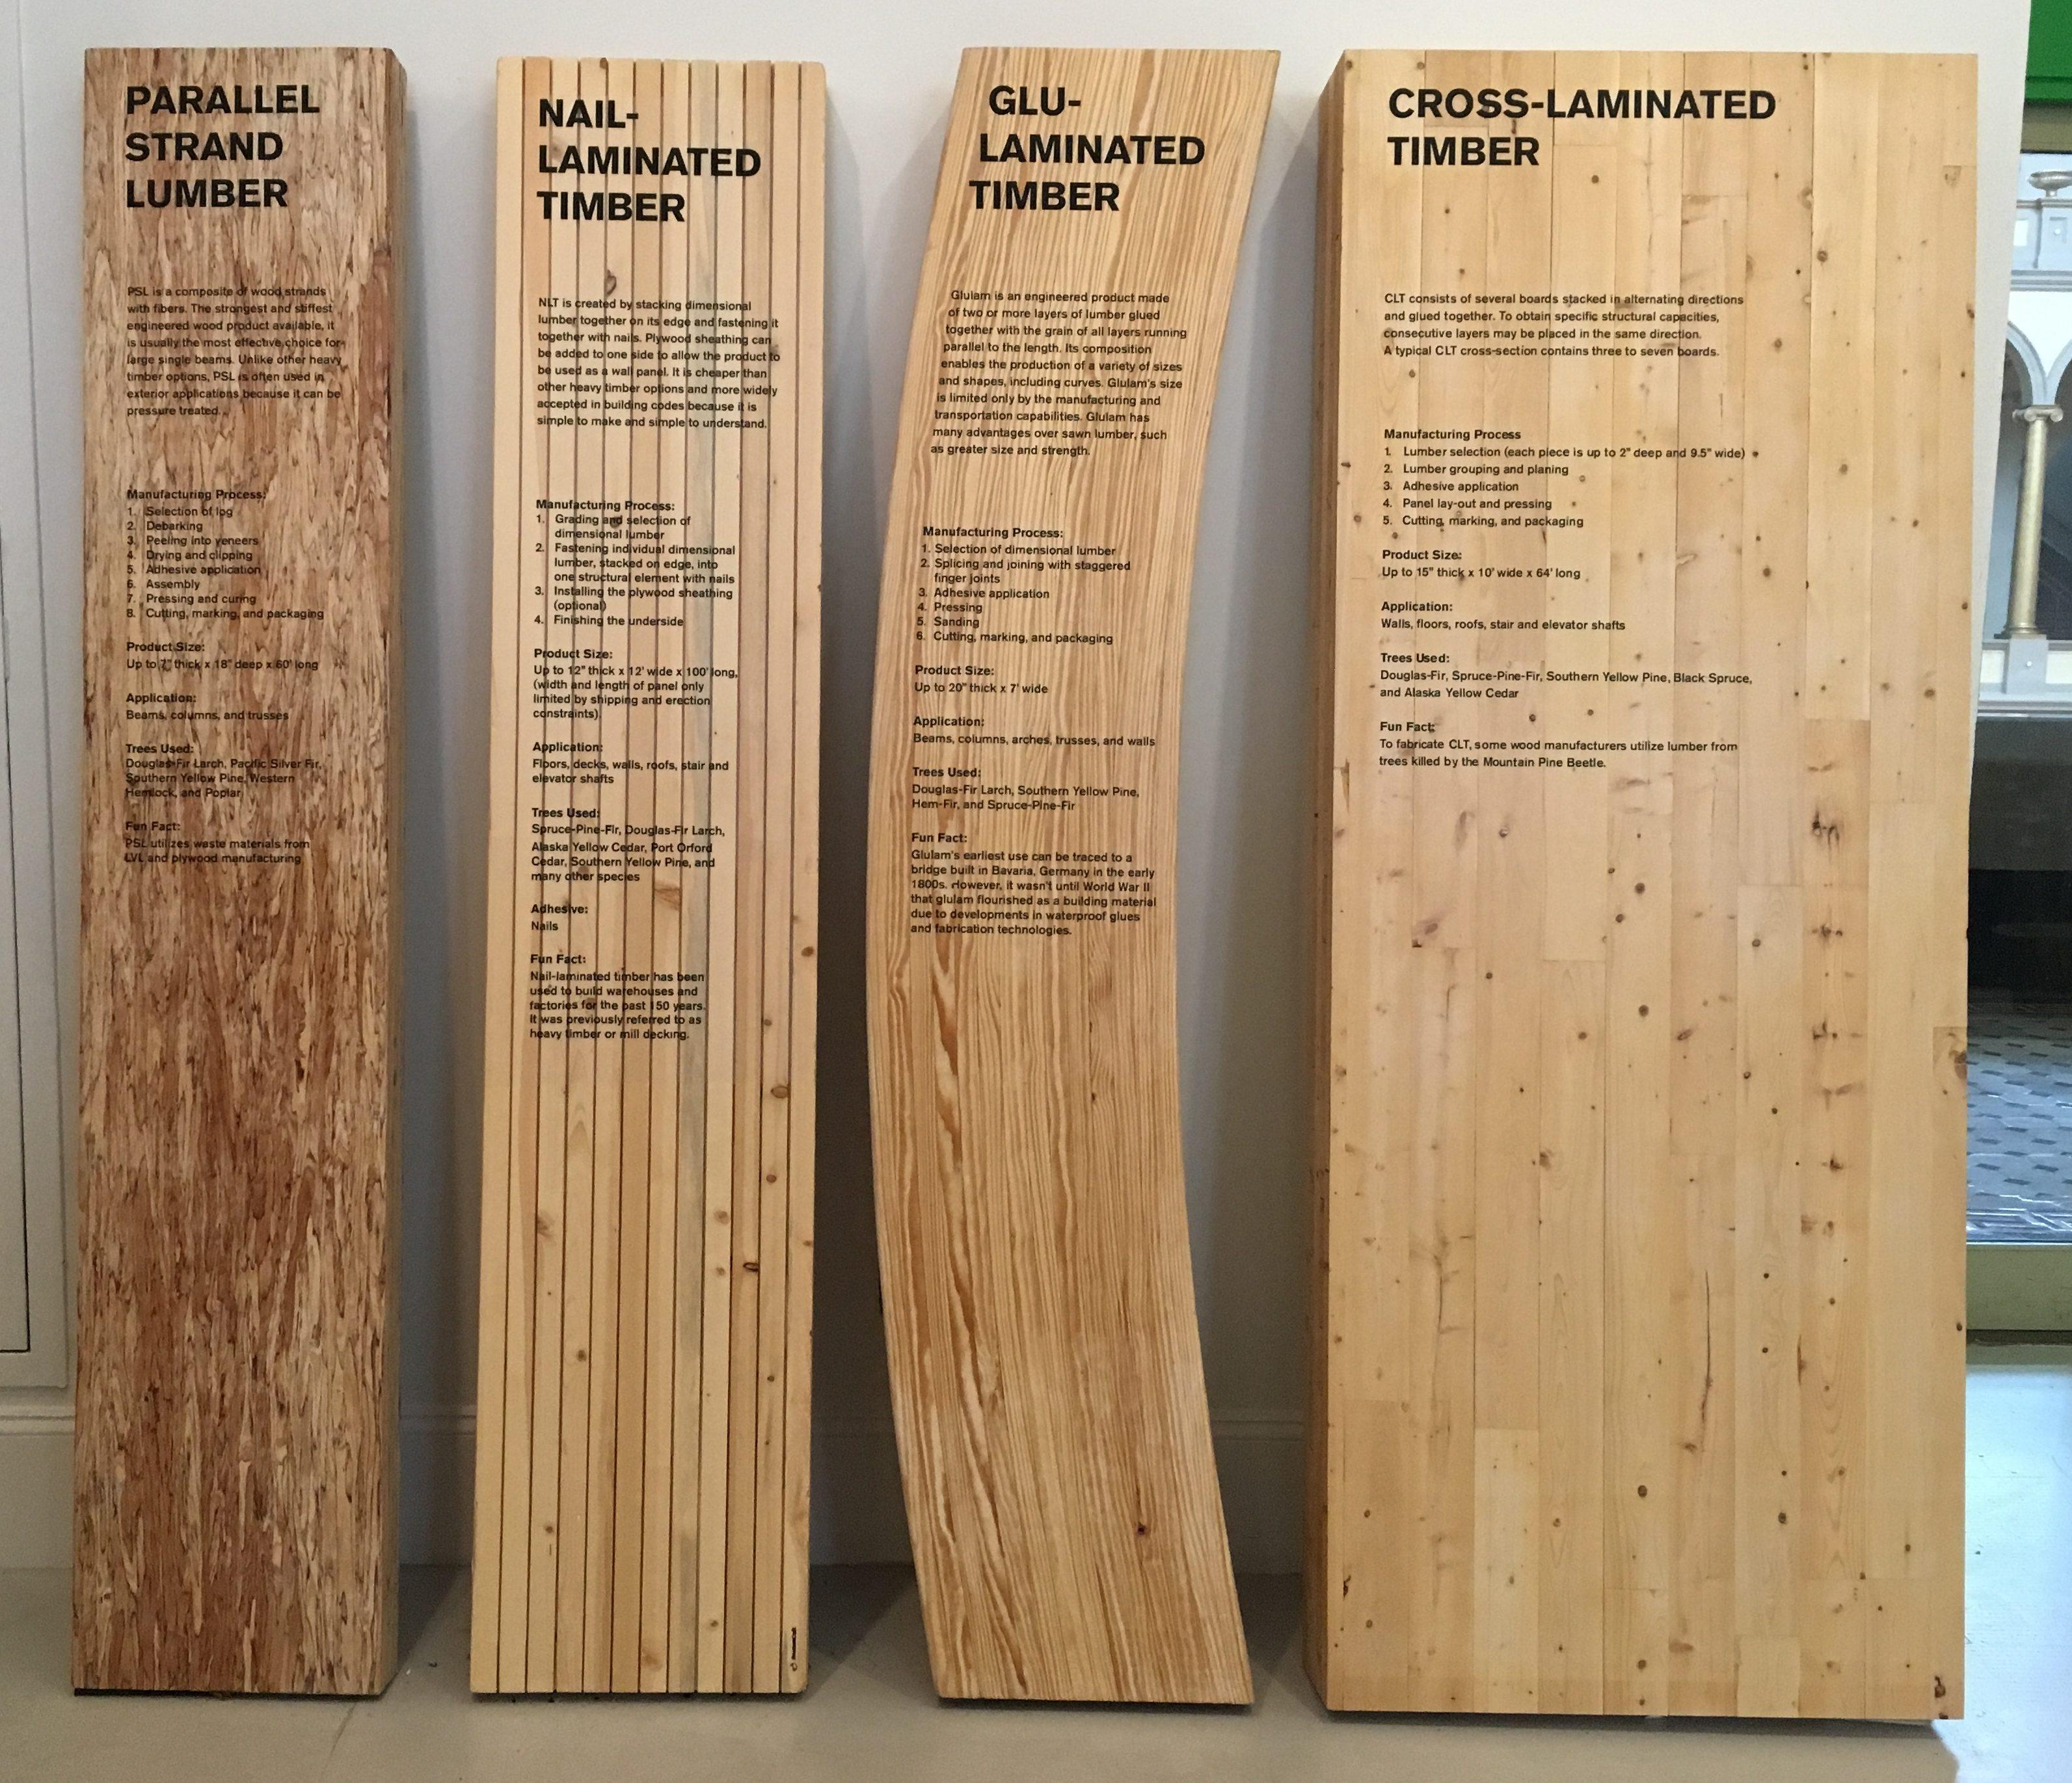 Types Of Wood Technology (Cristina Davia / Smart Growth